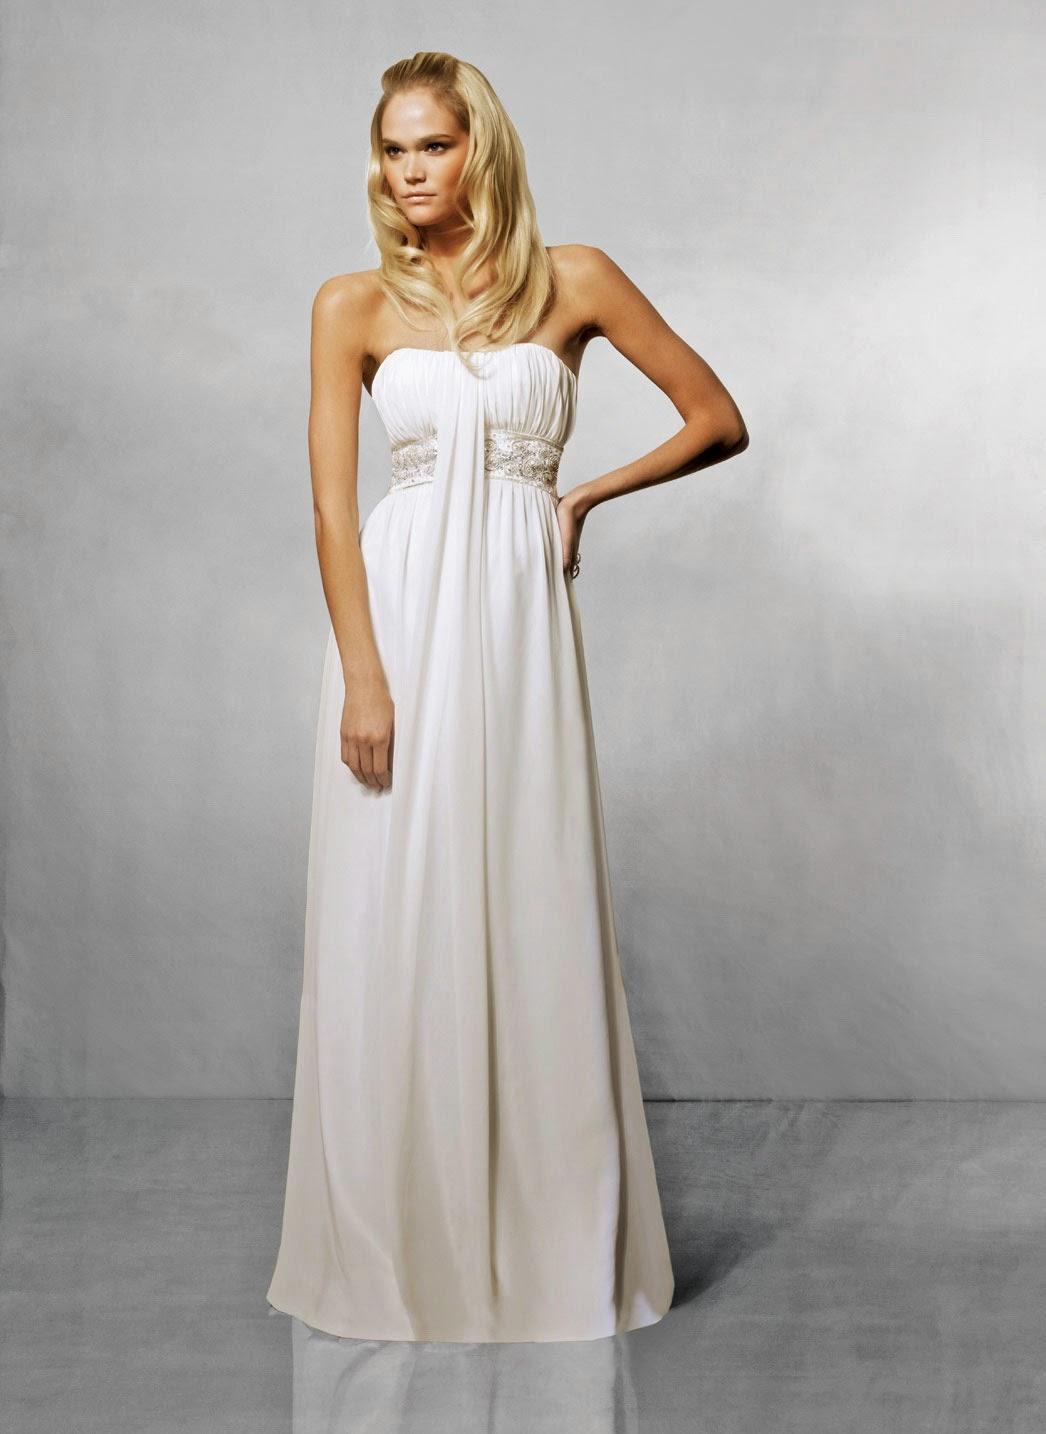 Designer Maternity Long Wedding Dresses Los Angeles Photos HD Ideas